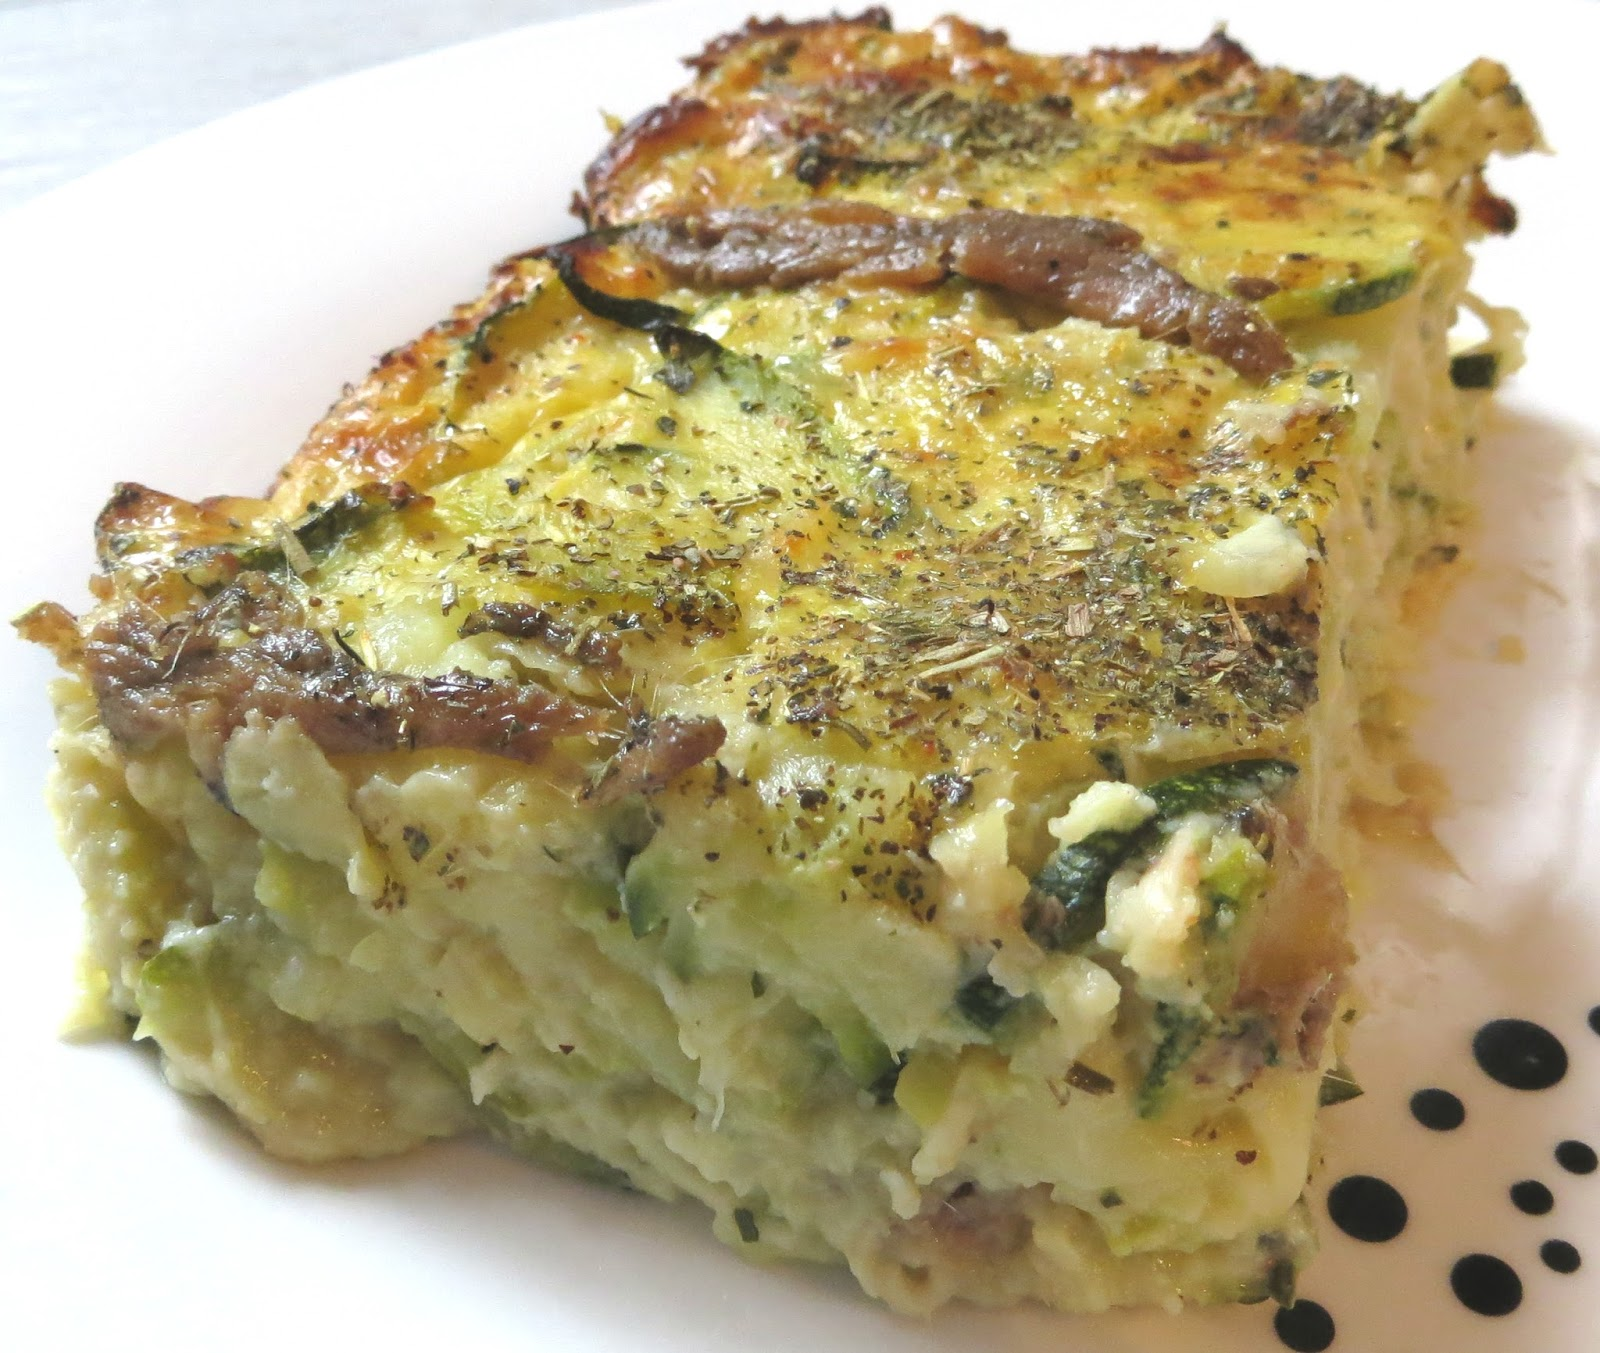 Cocotte forever: Flan courgettes-oignons aux anchois : 224